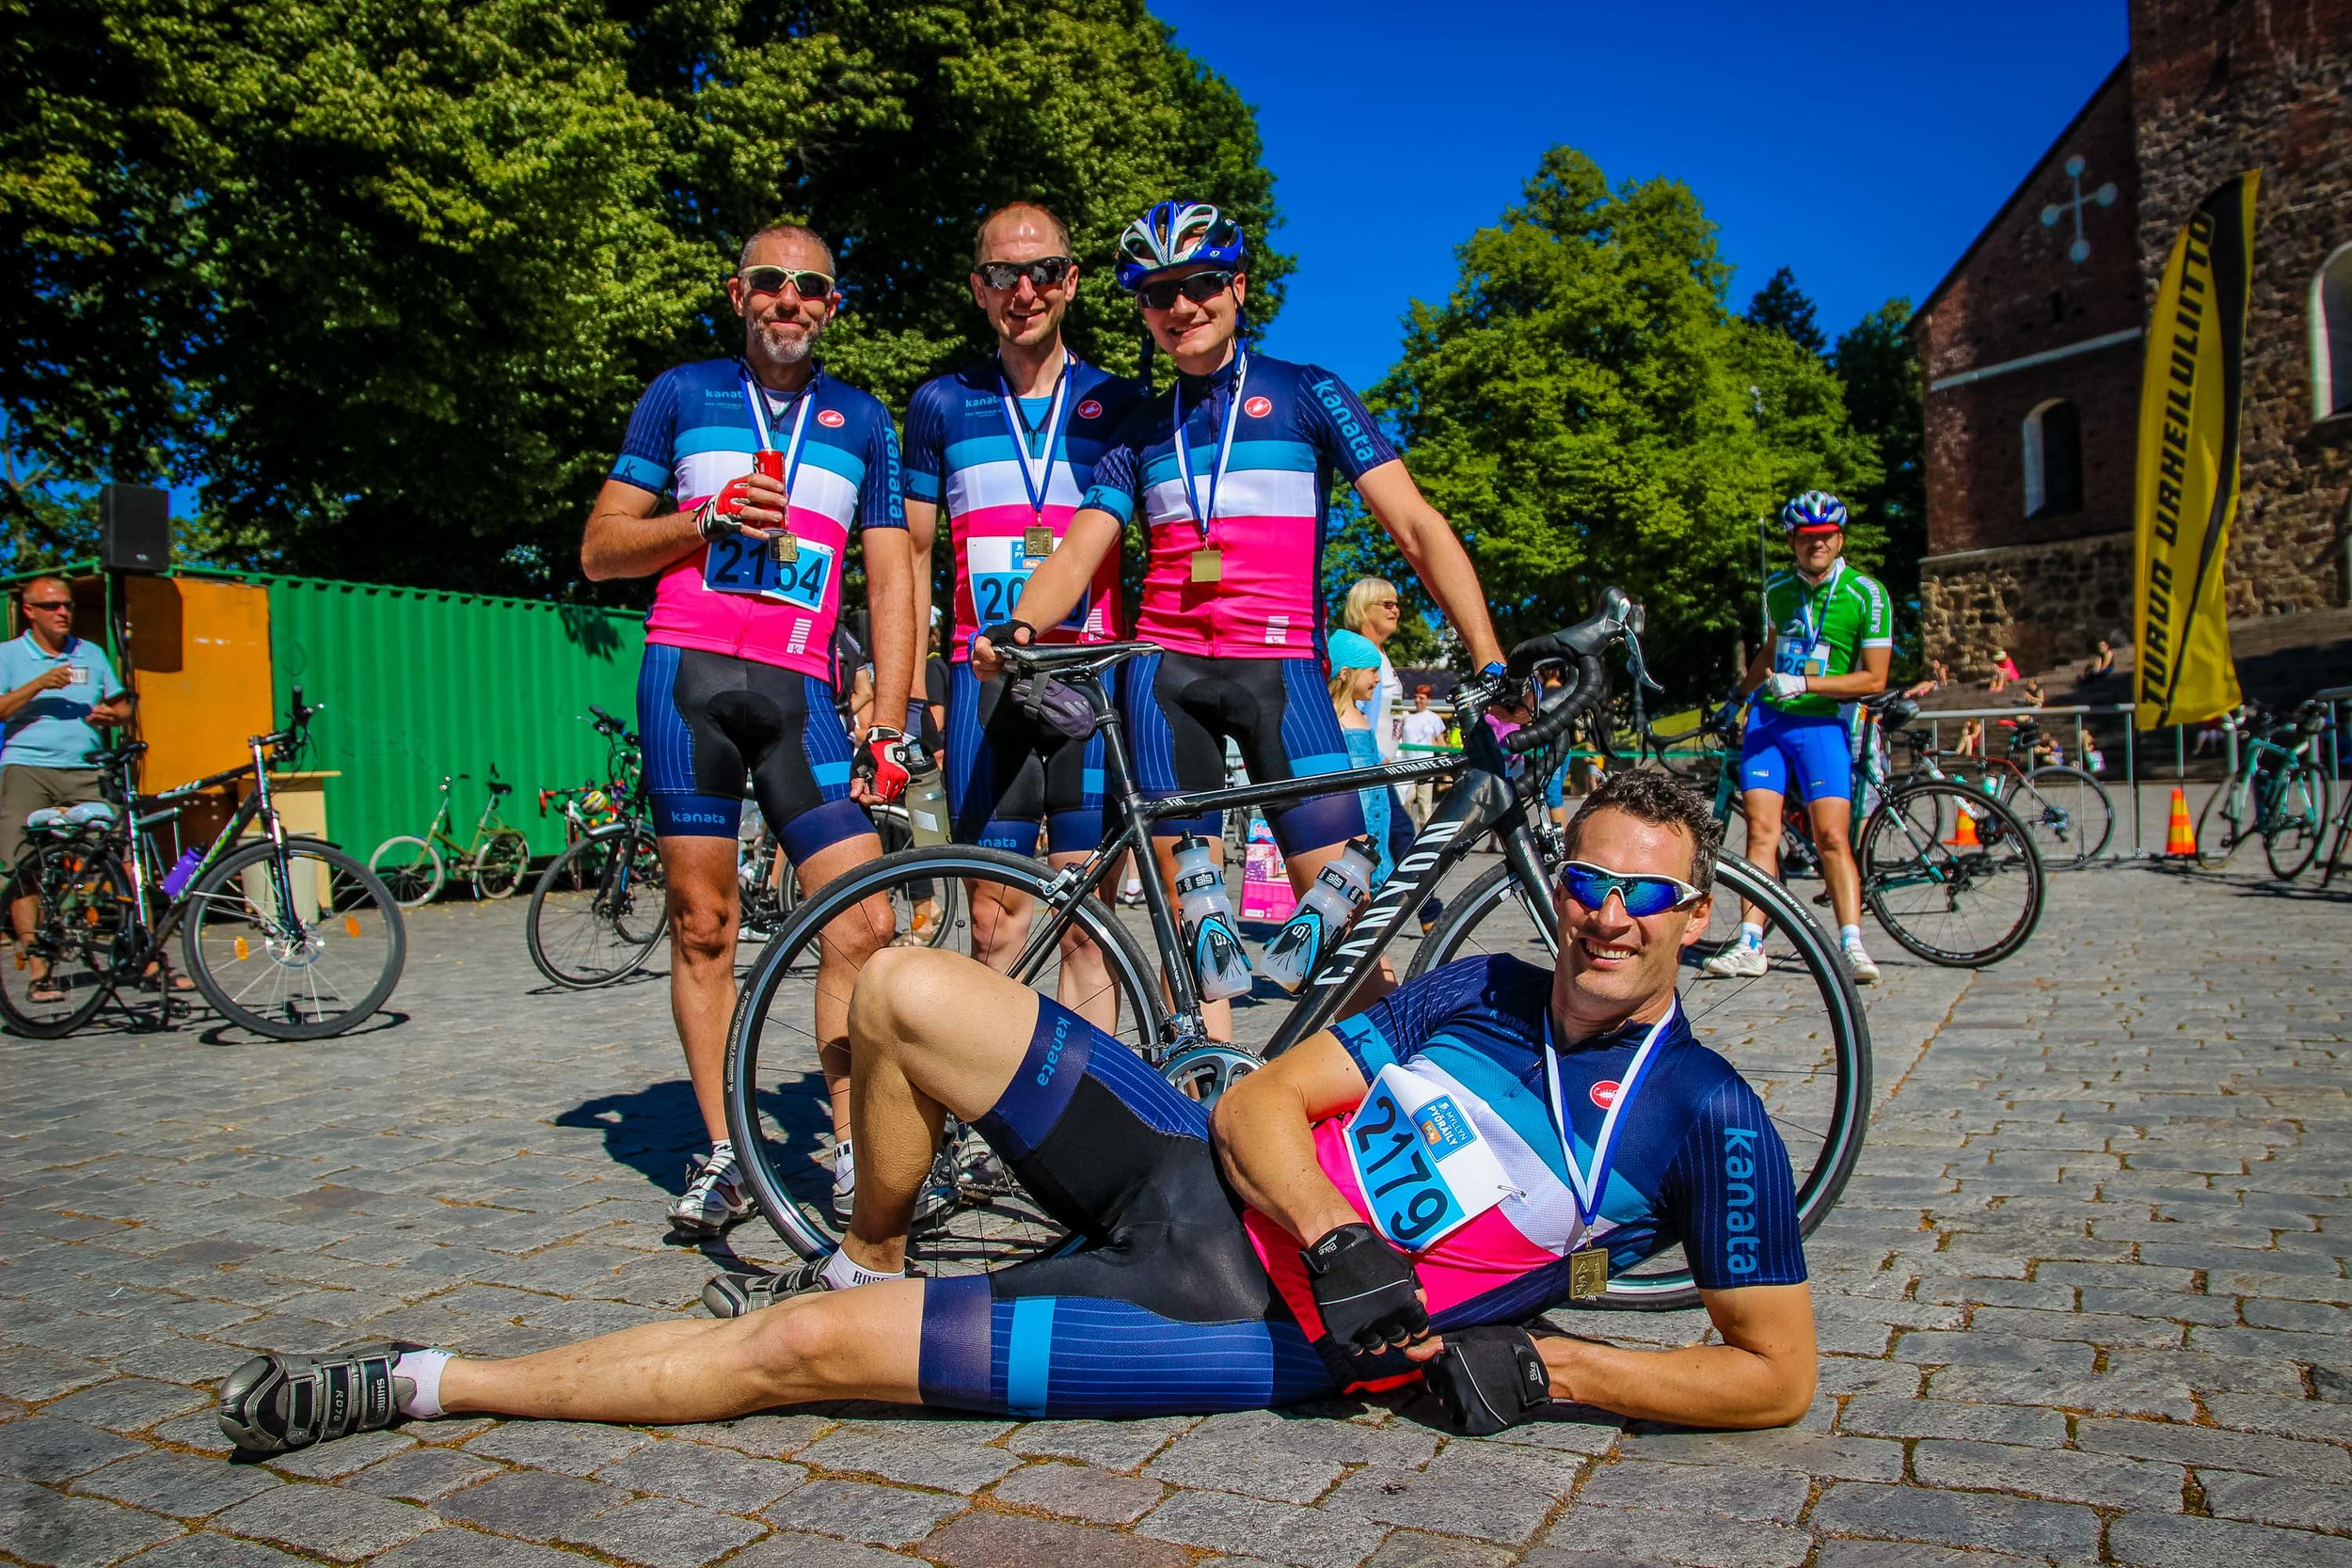 Kanata Racing Team after finishing Myllyn Pyöräily. All smiles!